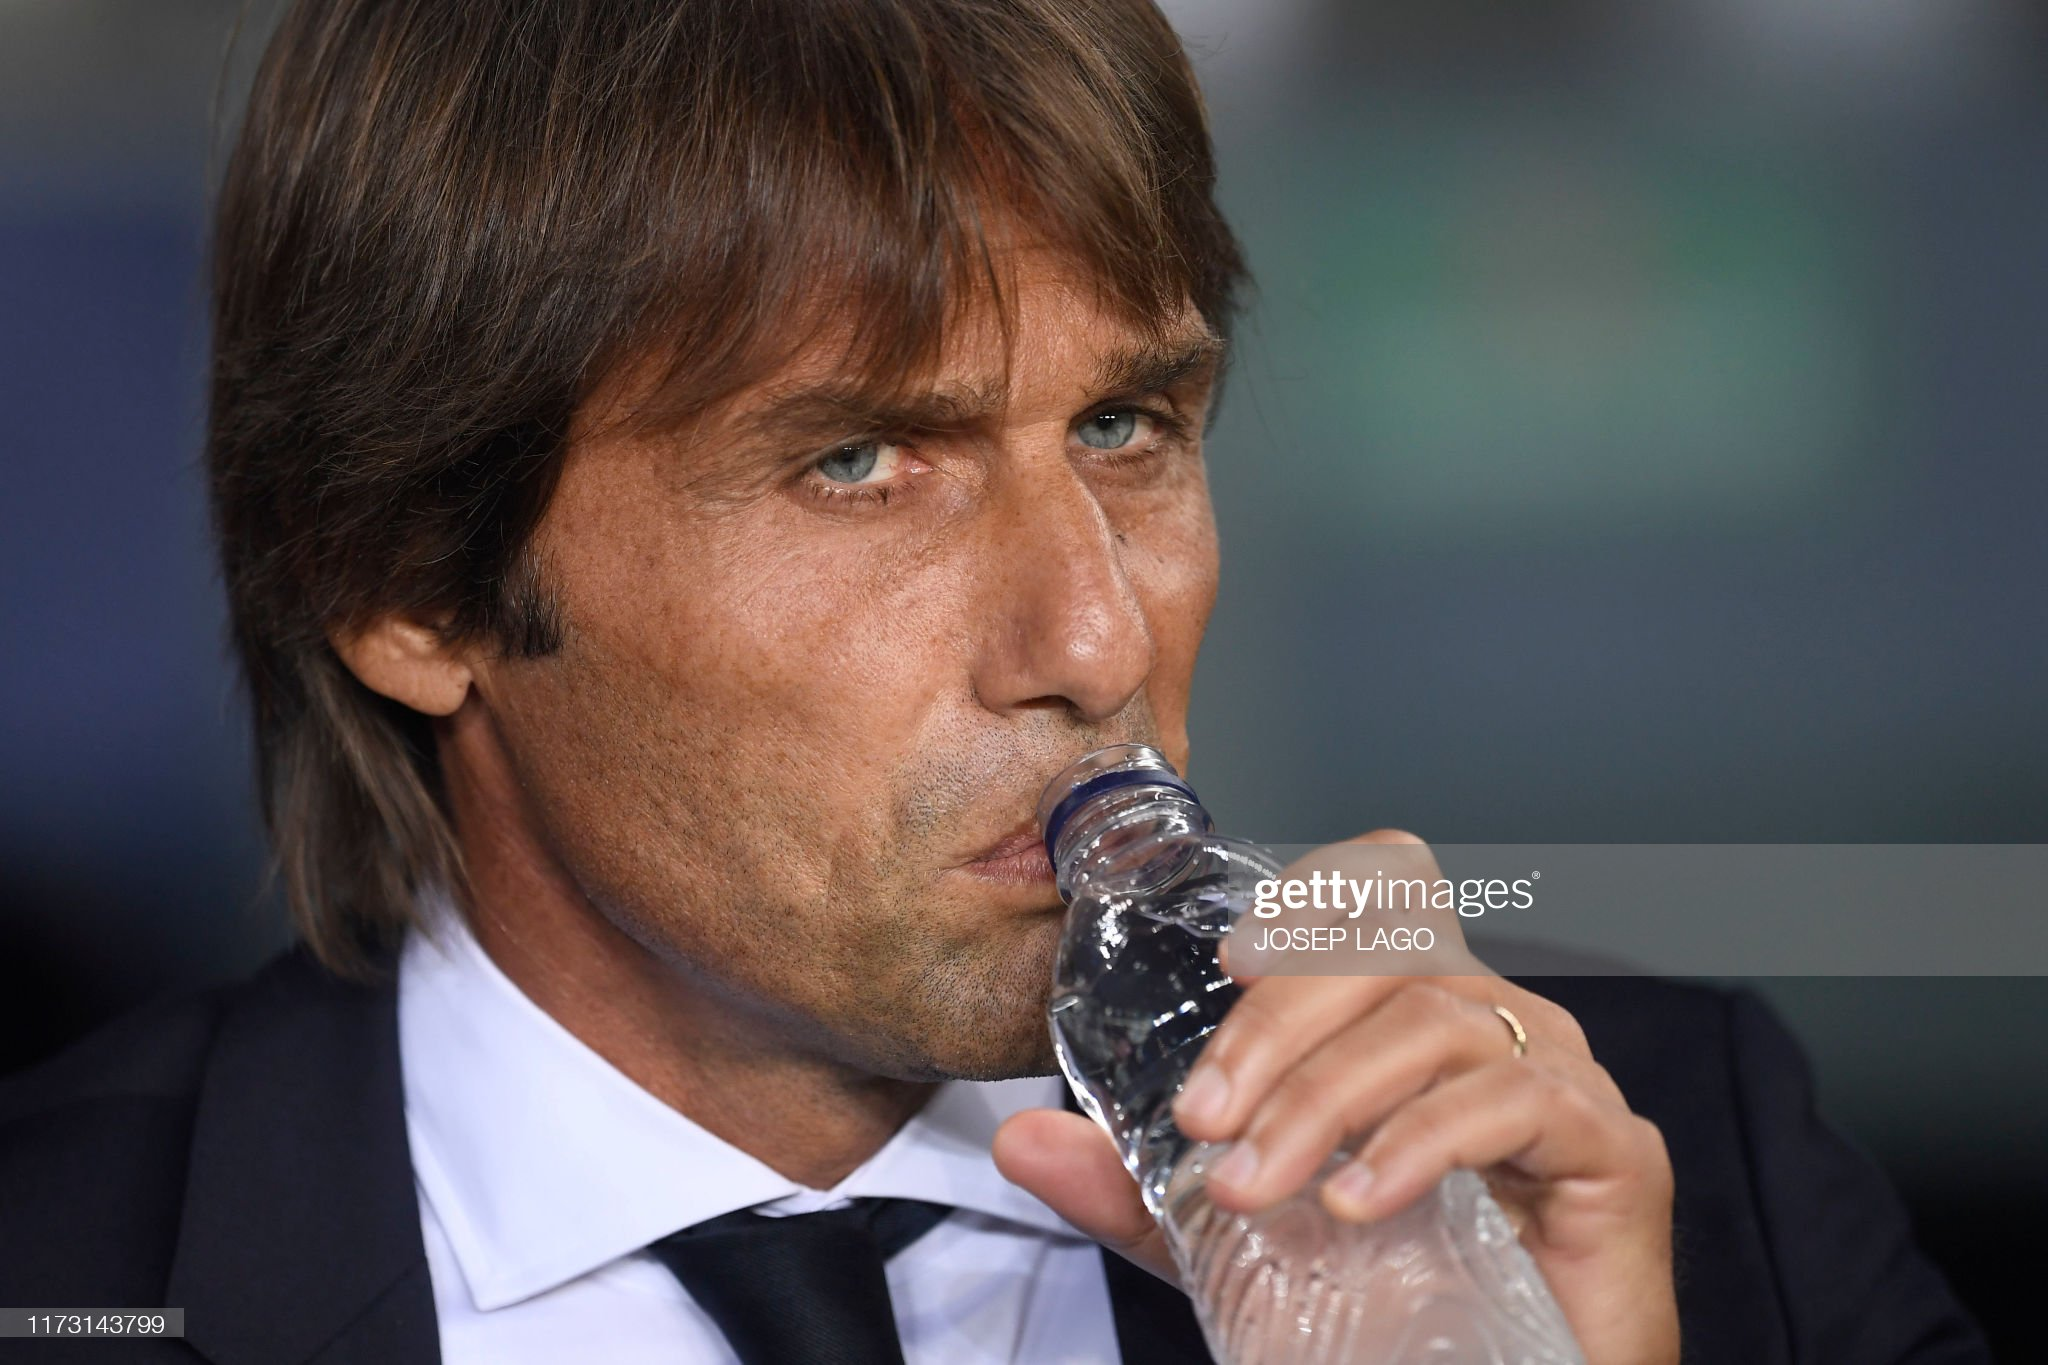 صور مباراة : برشلونة - إنتر 2-1 ( 02-10-2019 )  Inter-milans-italian-coach-antonio-conte-drinks-water-before-the-uefa-picture-id1173143799?s=2048x2048